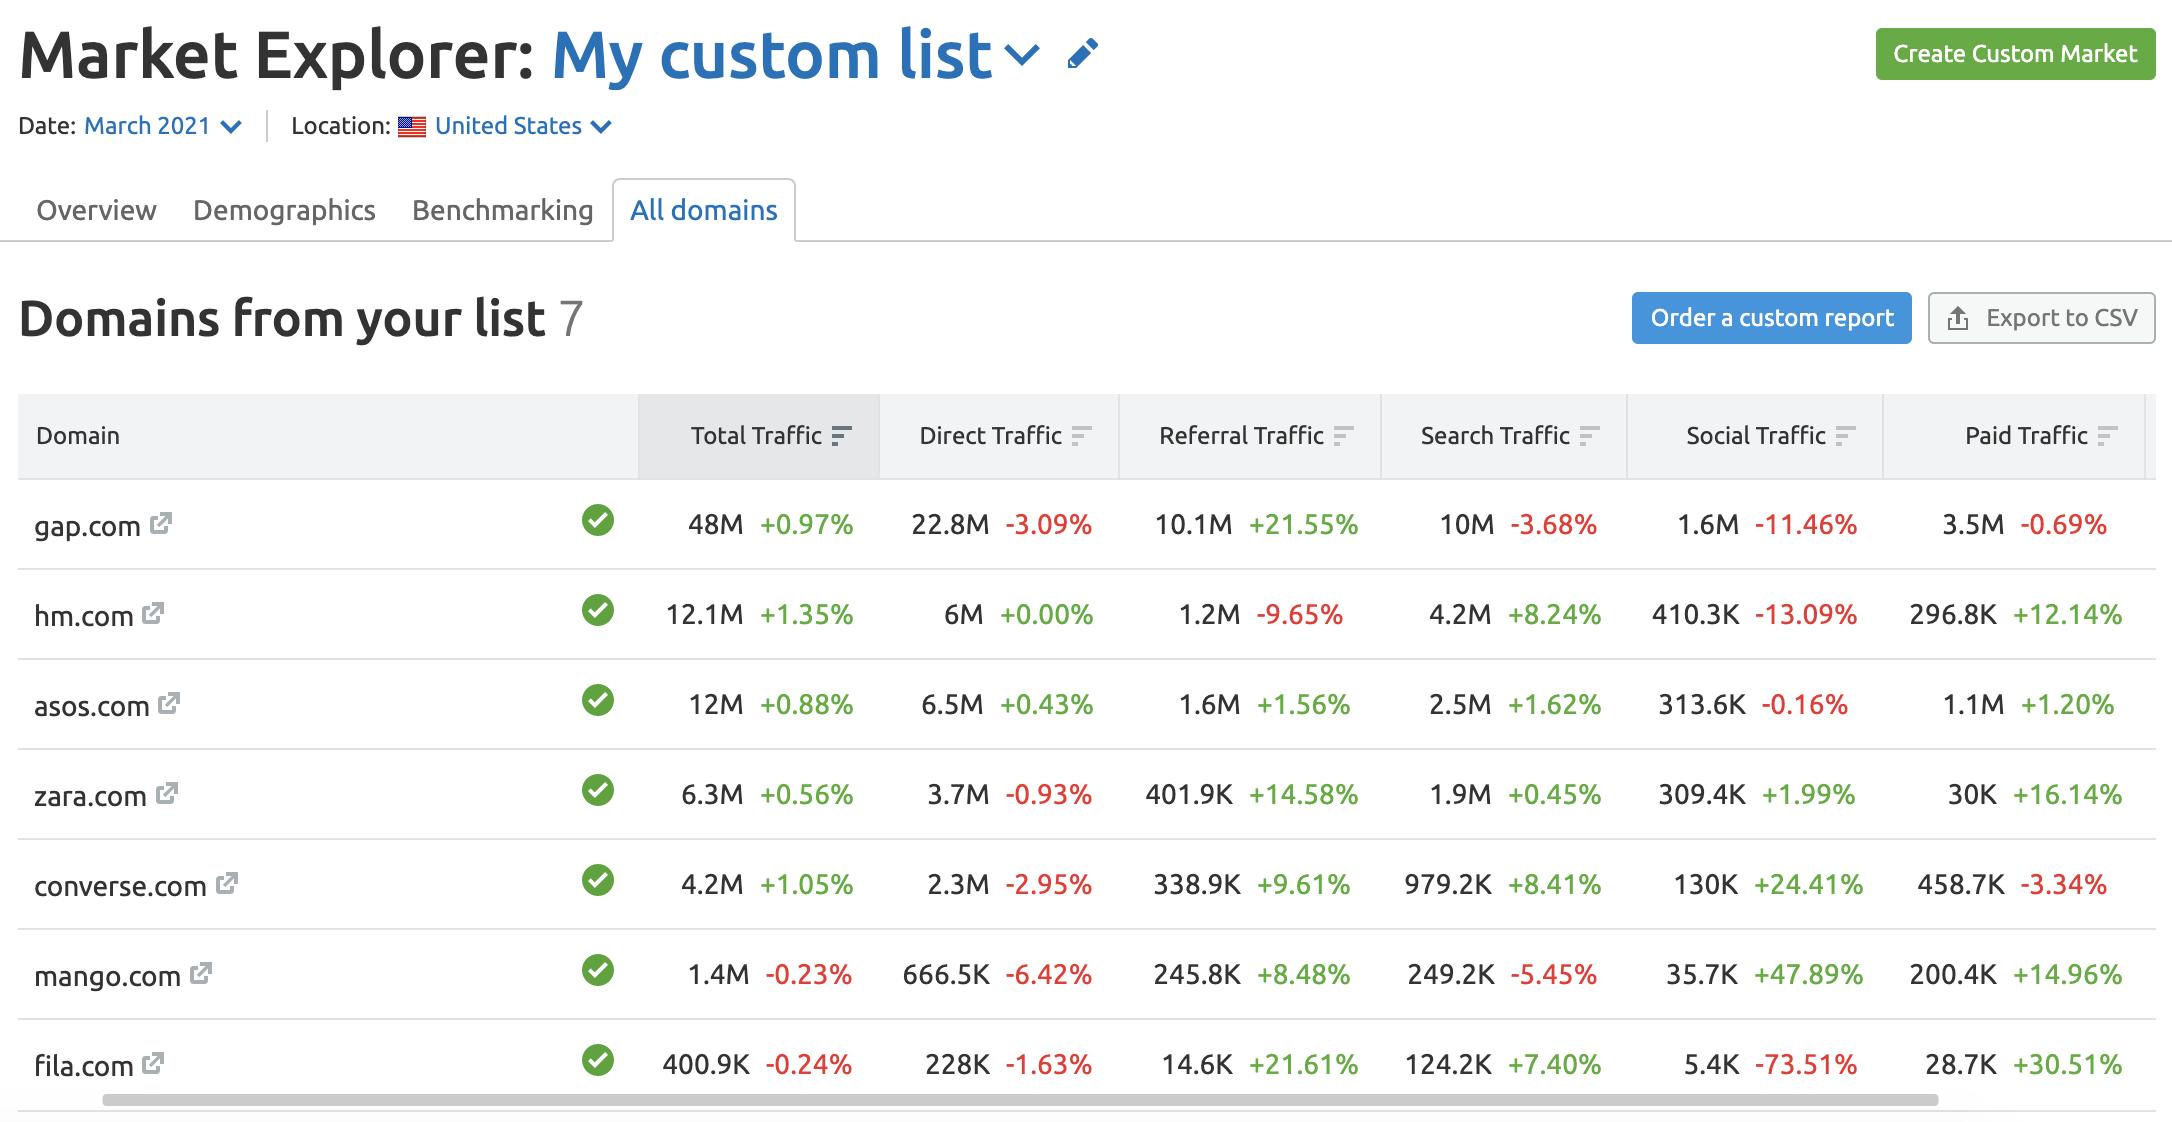 Market Explorer all domains